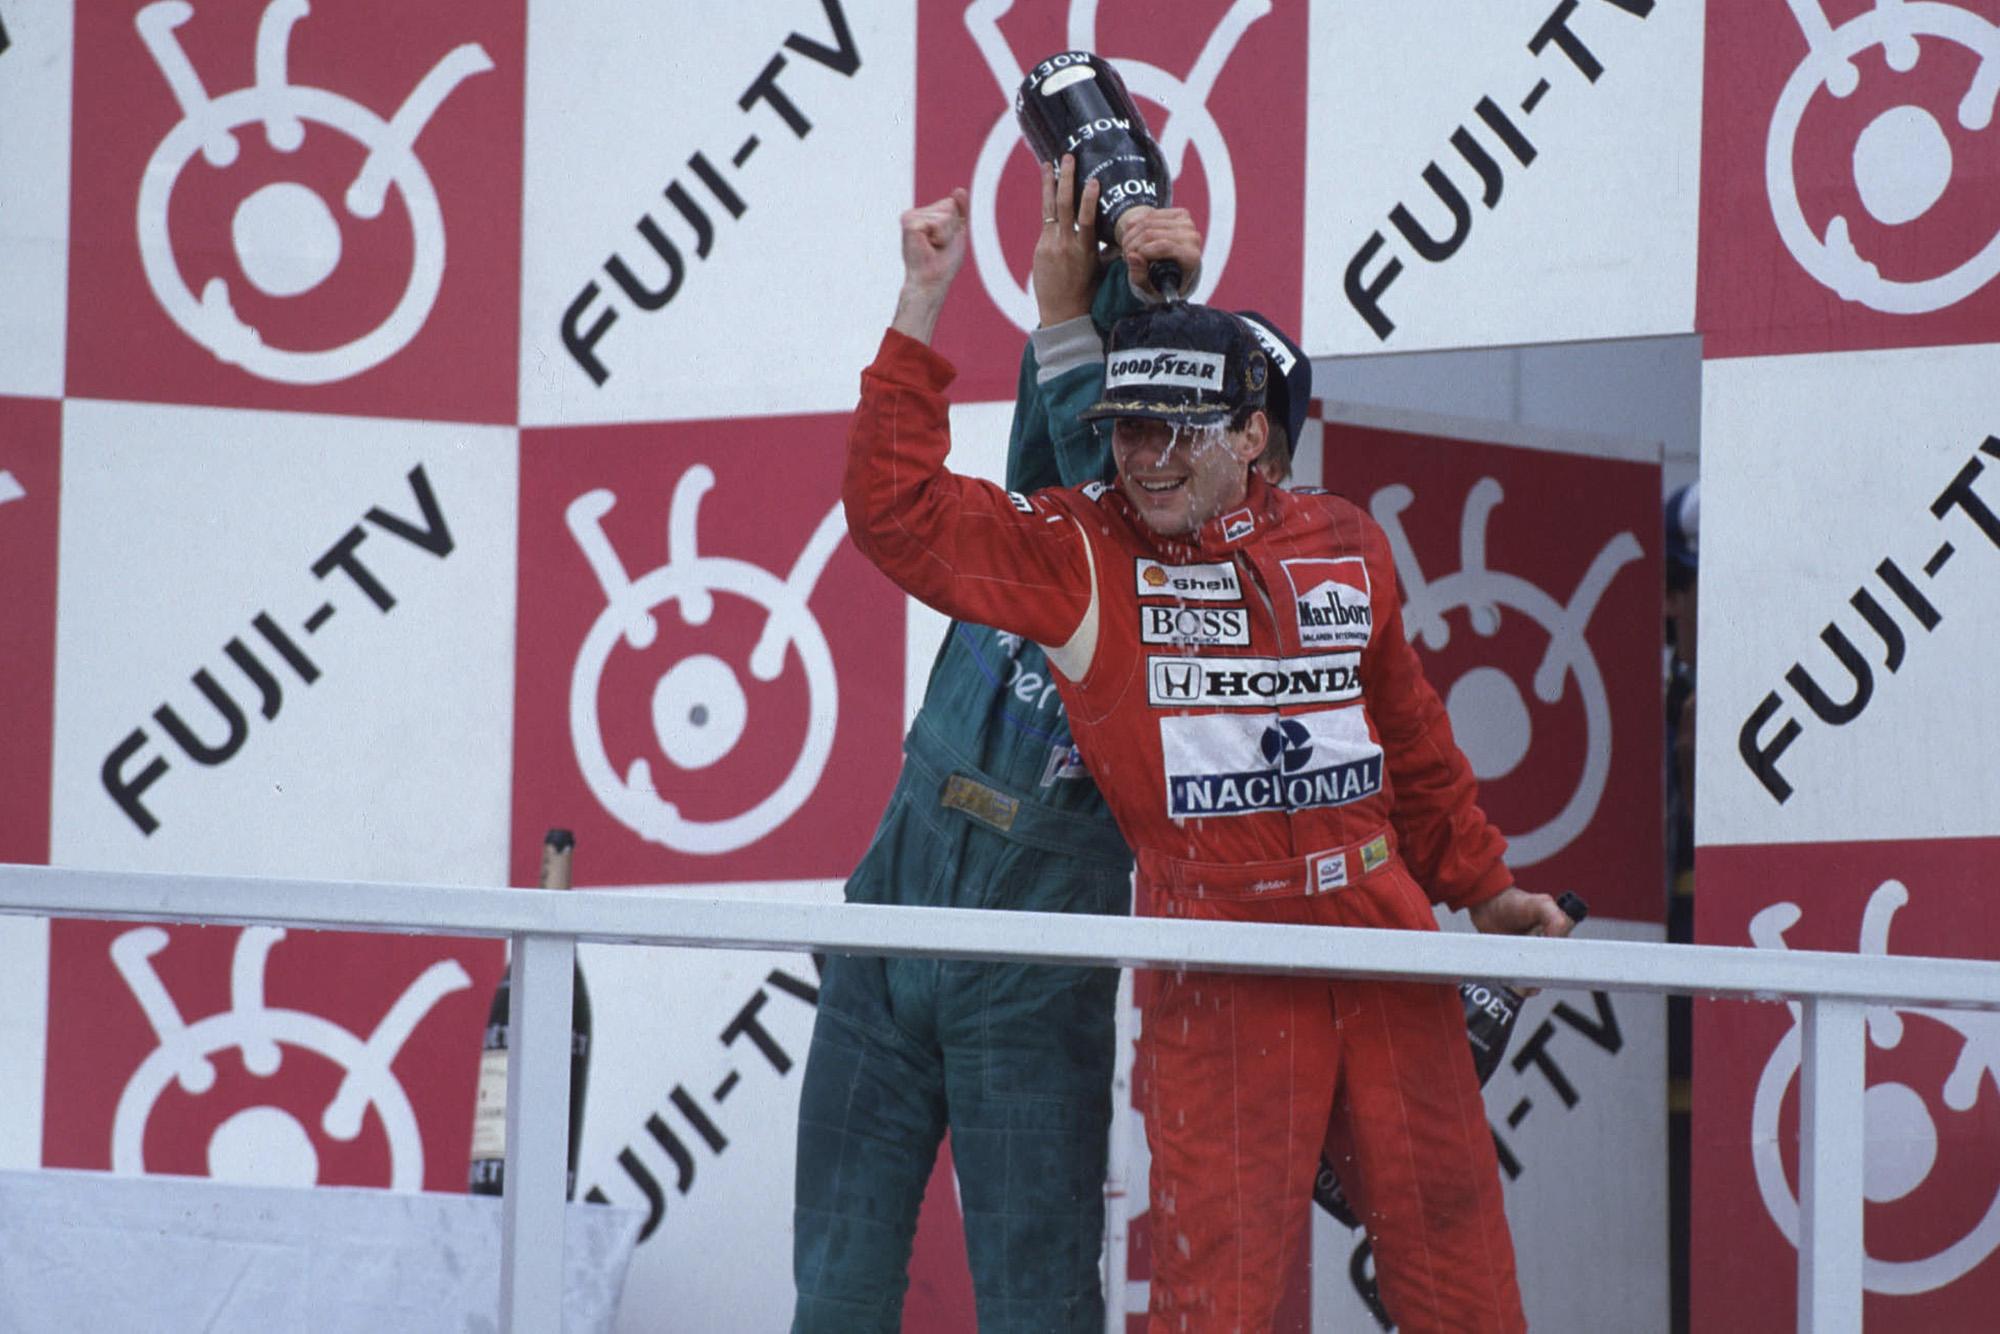 Ayrton Senna celebrates winning his first F1 world championship at the 1988 Japanese Grand Prix